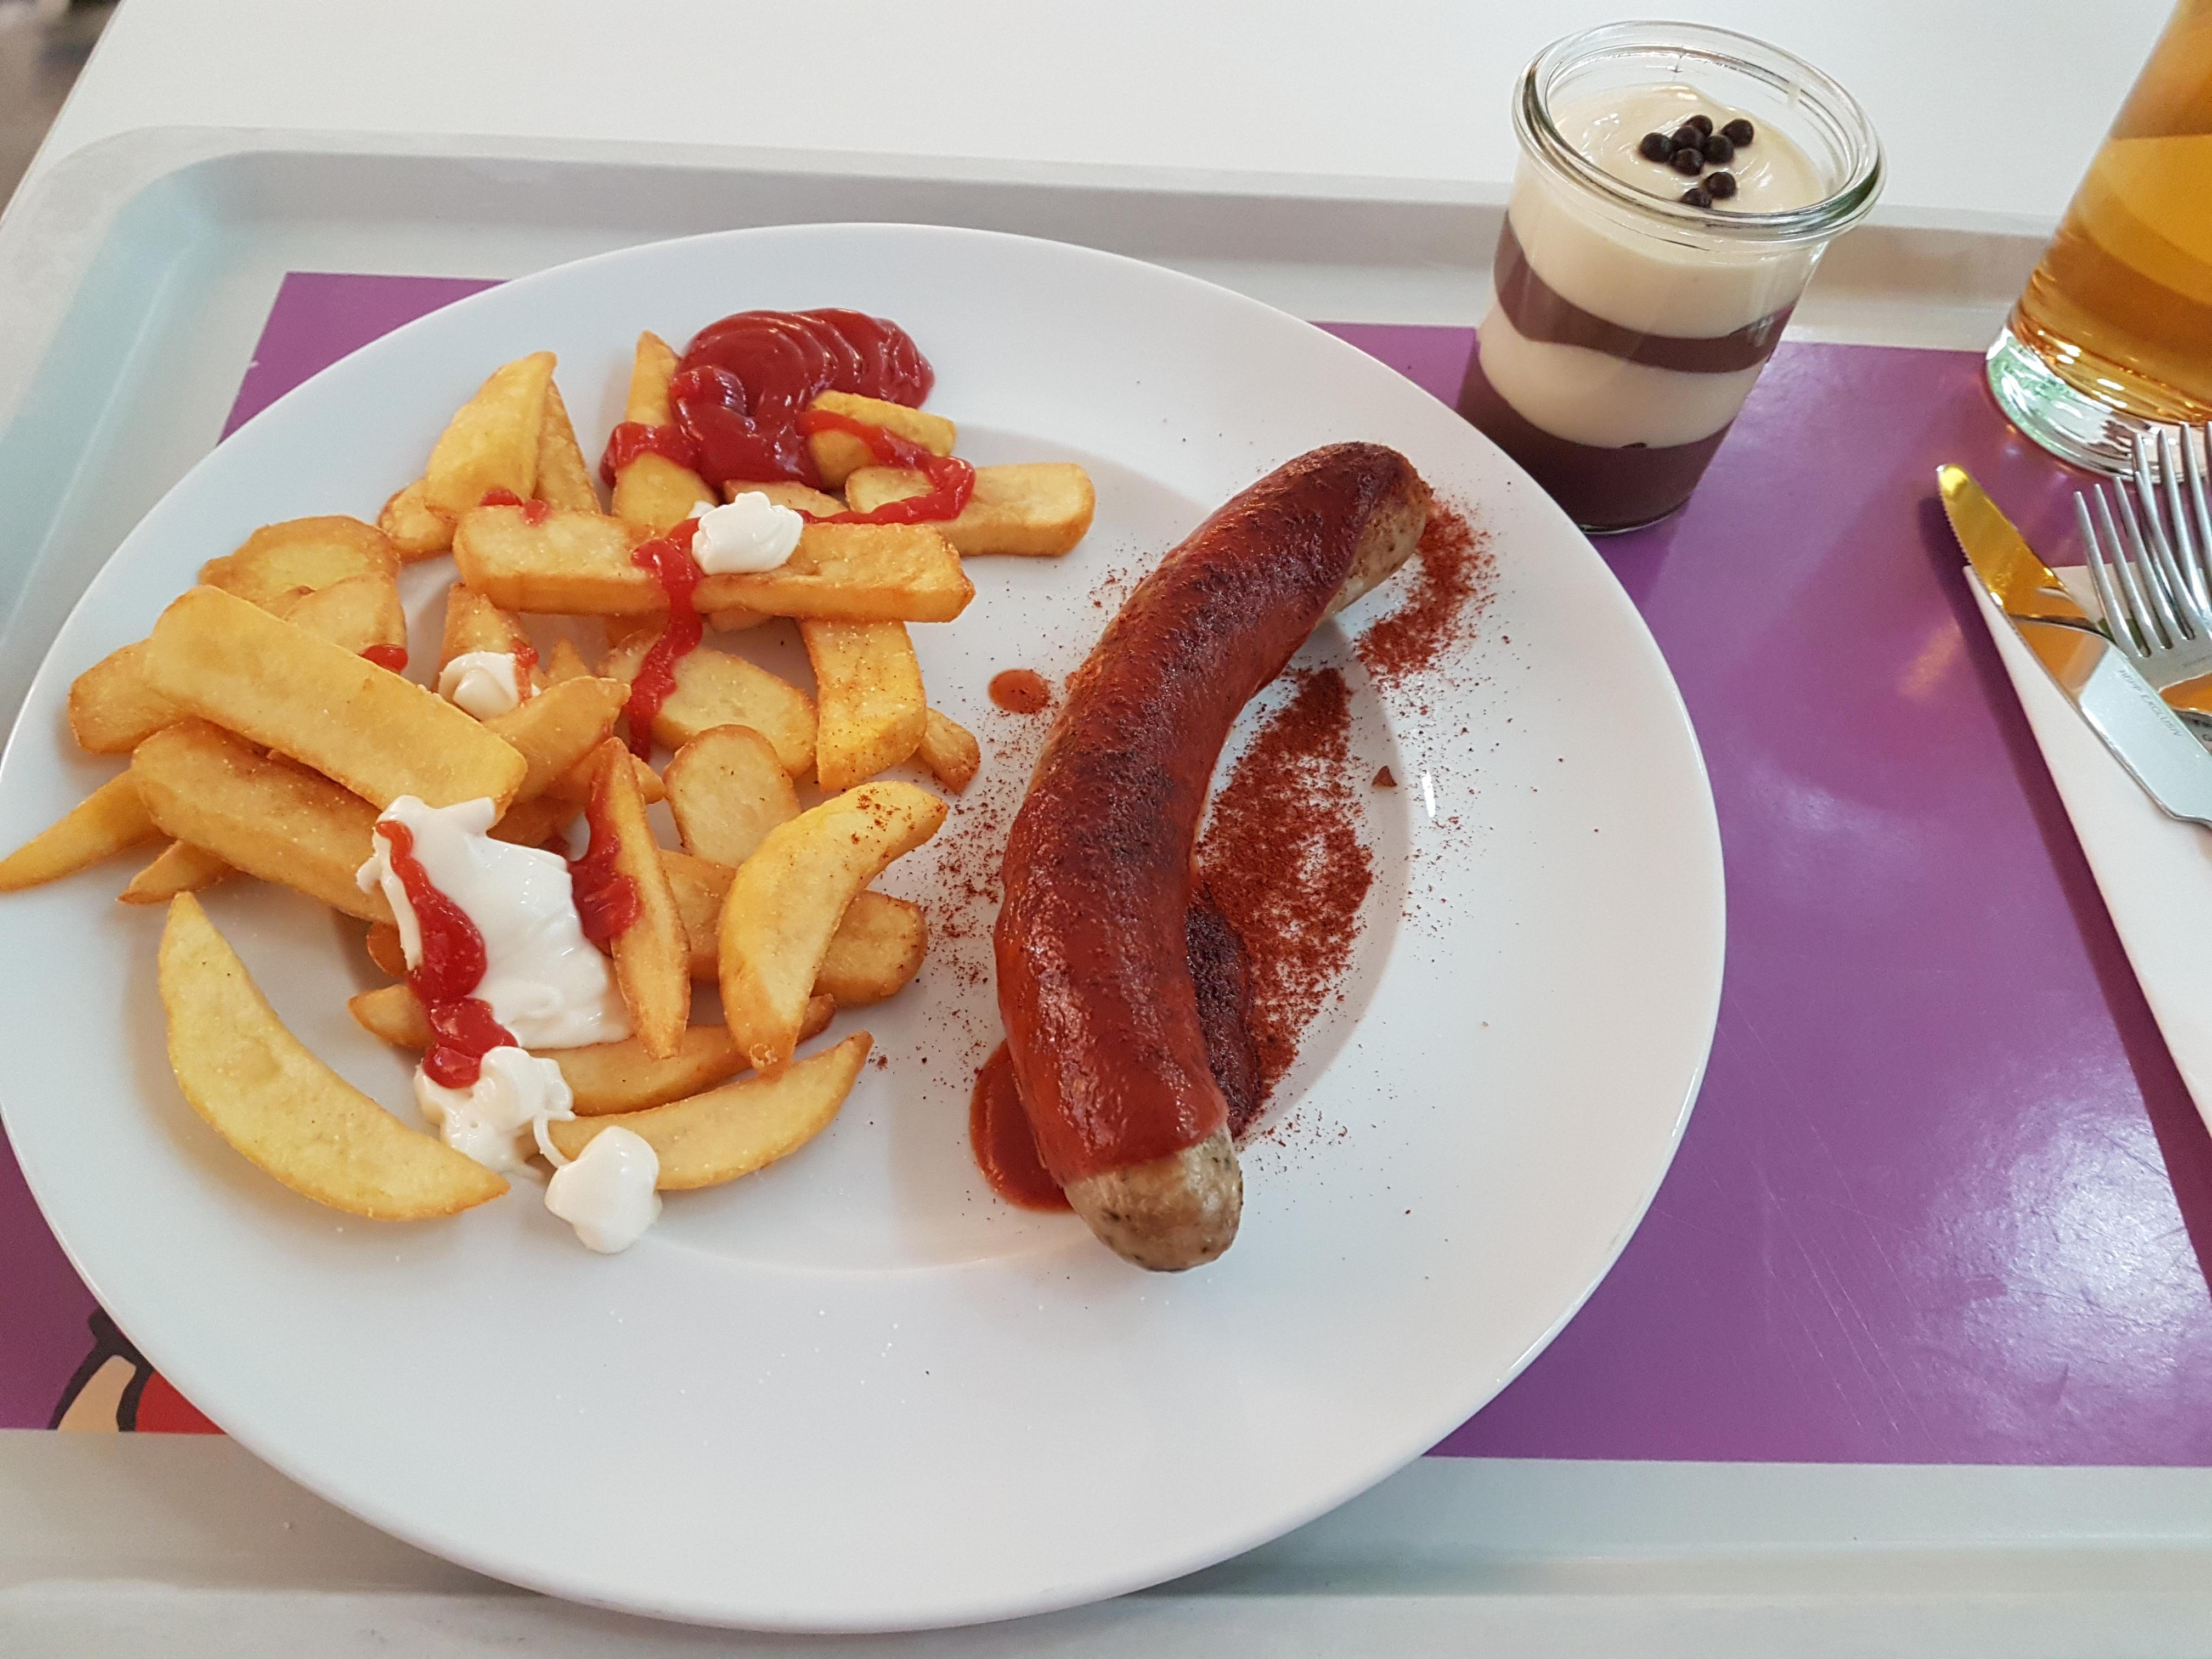 https://foodloader.net/Holz_2018-11-19_Bratwurst_mit_Pommes.jpg